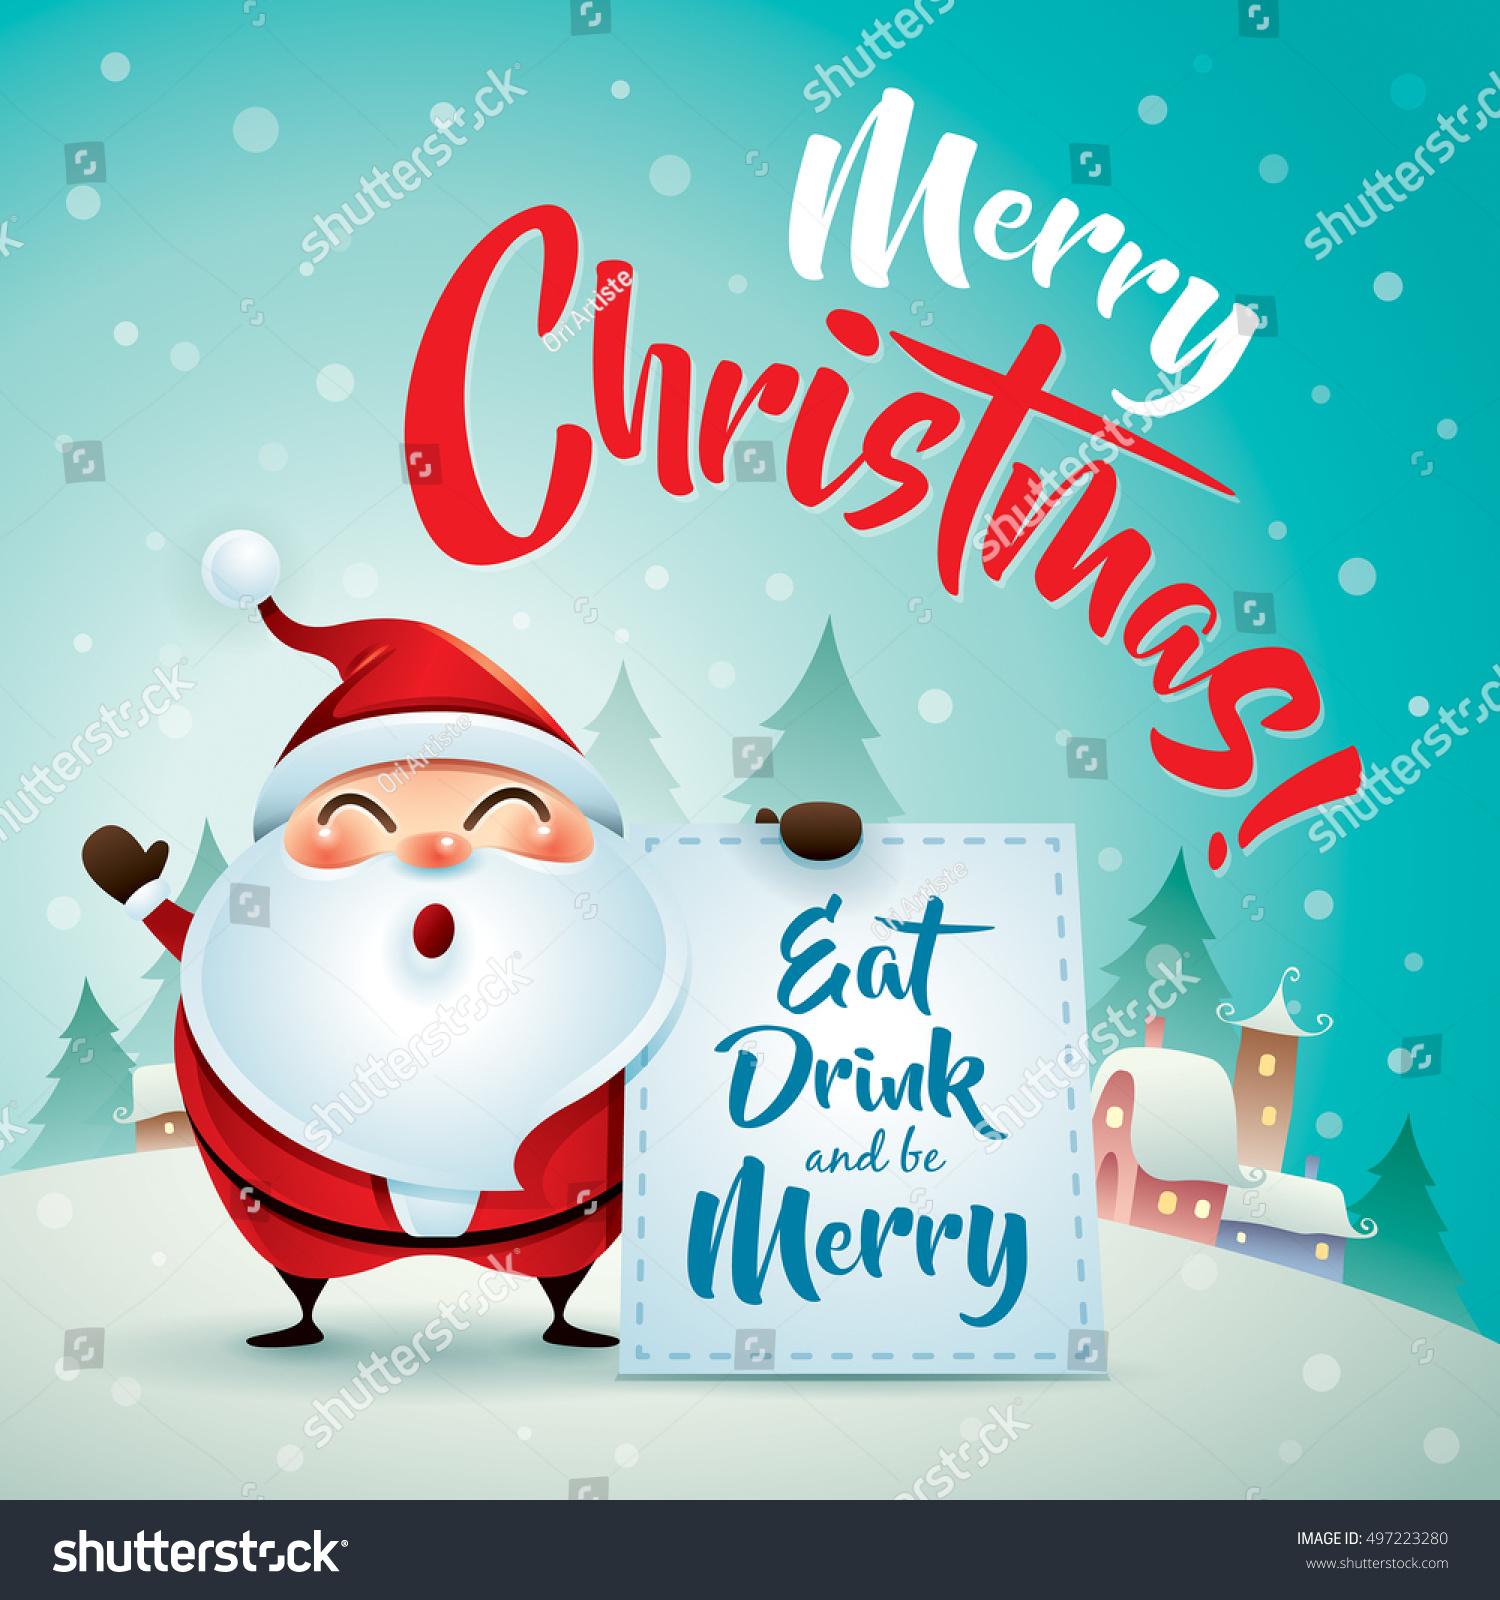 Merry Christmas Santa Claus Christmas Snow Stock Vector 497223280 ...